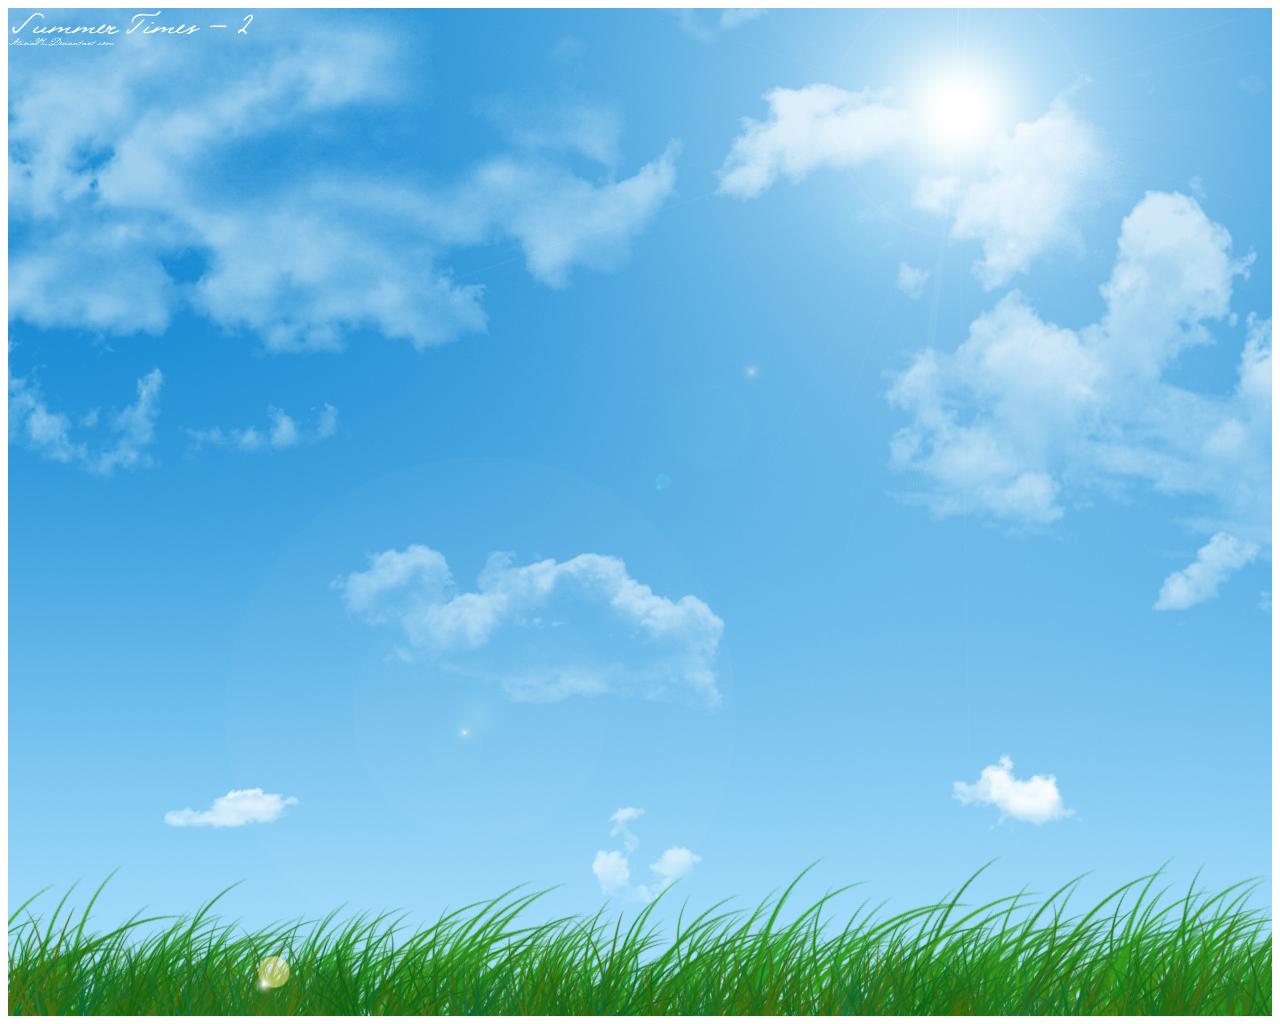 Unduh 9700 Background Rumput Awan Gratis - Download Background